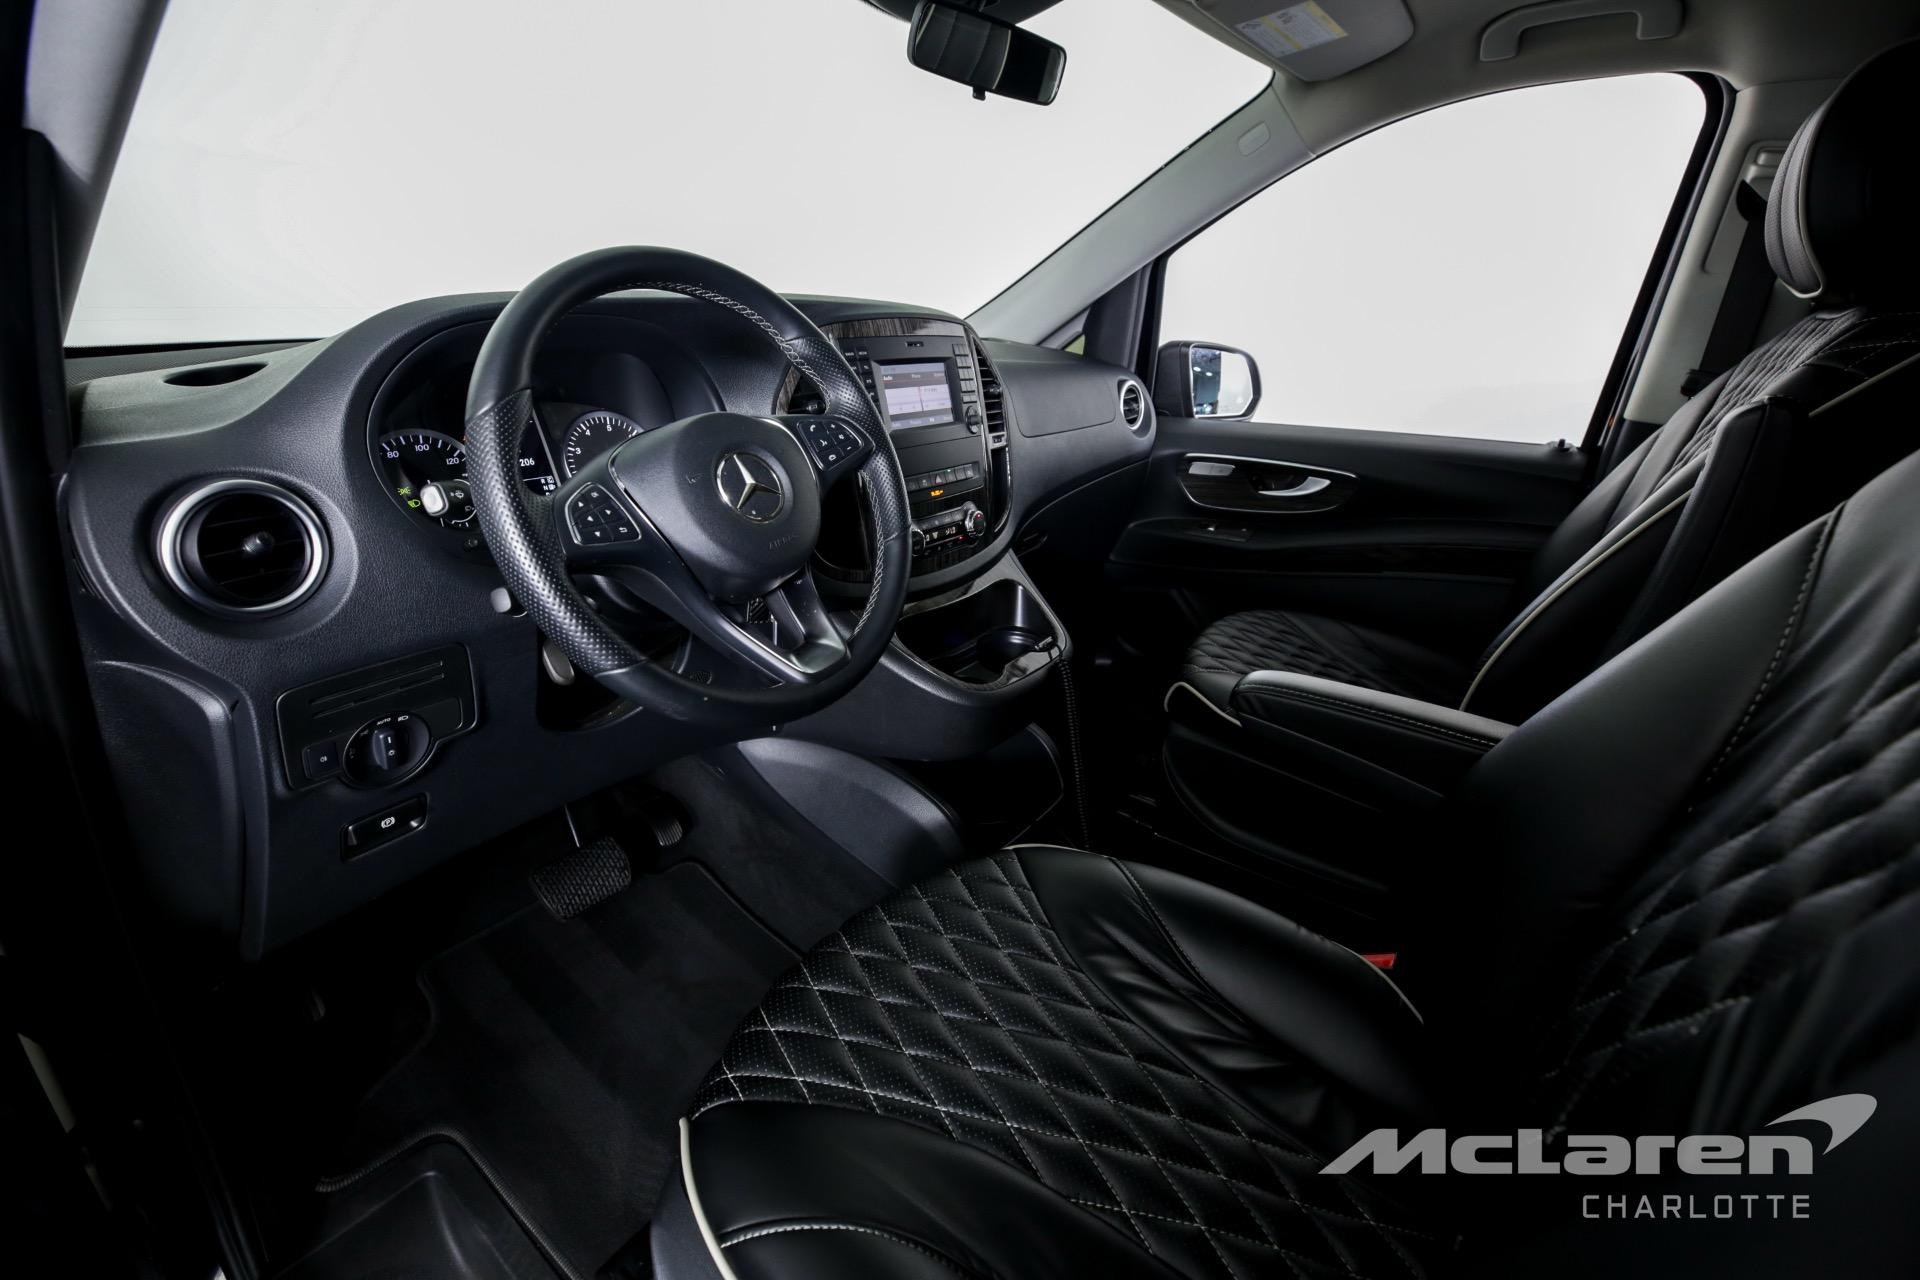 Used 2018 Mercedes-Benz Metris Passenger | Charlotte, NC